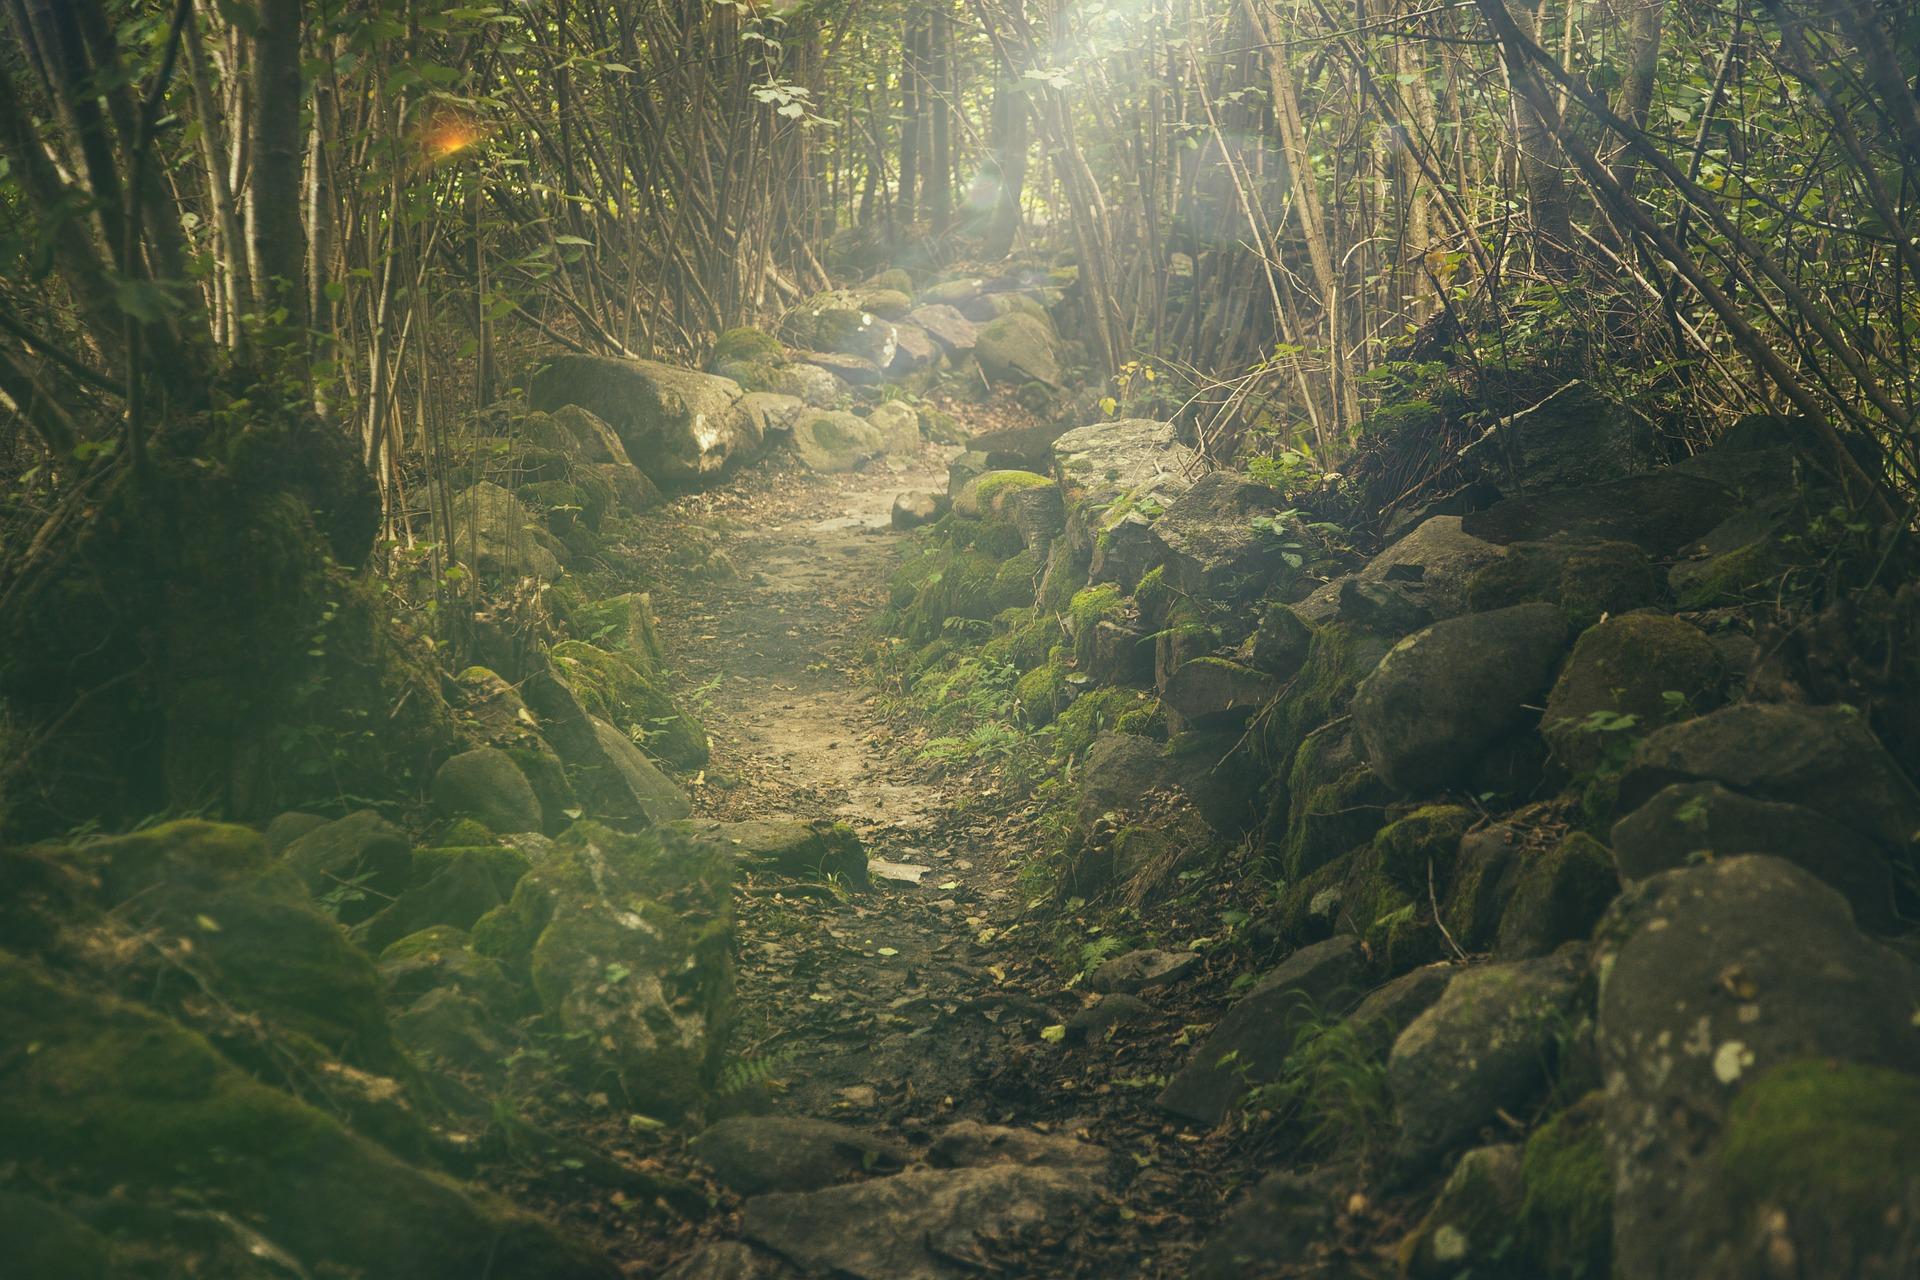 A Path Not So Smooth- Udaybhanu Singh